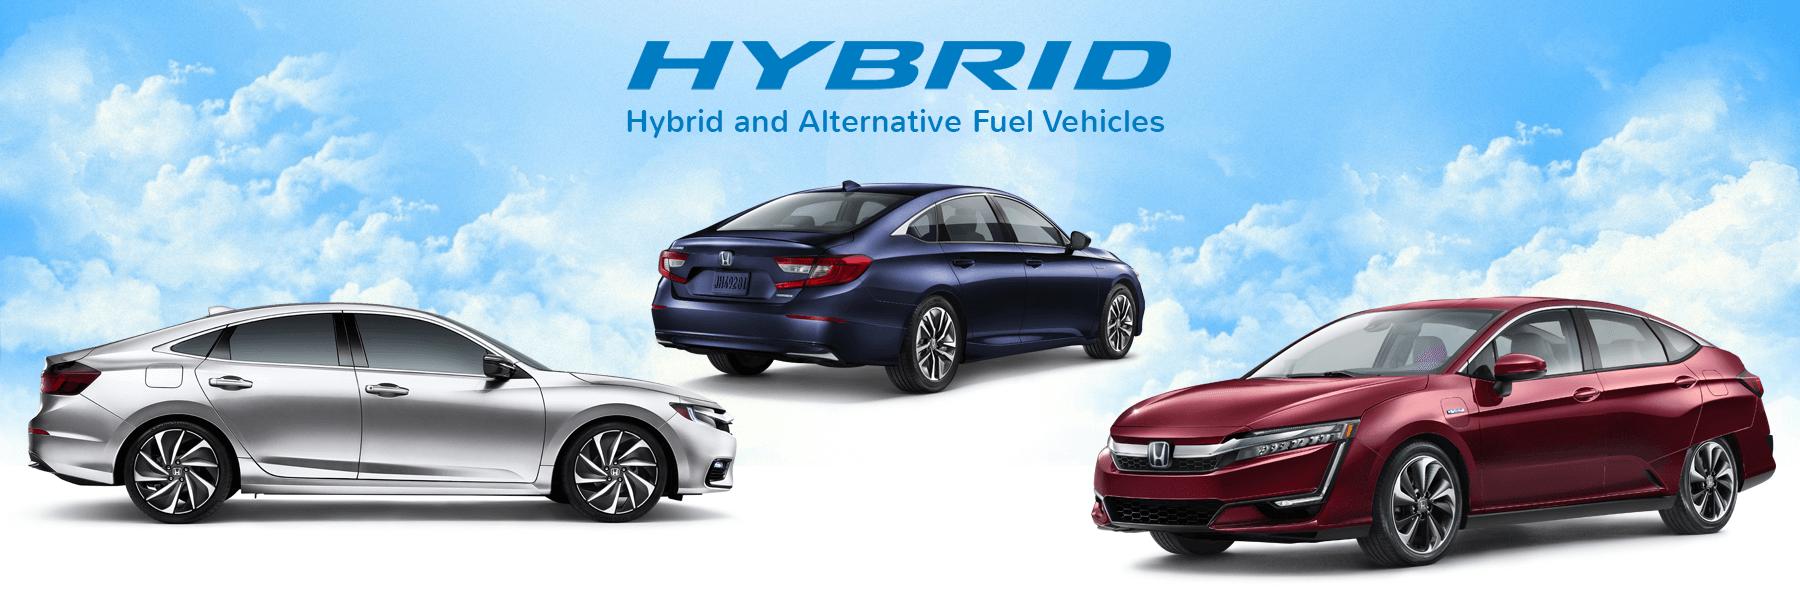 Honda Hybrid Cars >> Find Hybrid Cars With Best Mpg At Your Tri State Honda Dealer